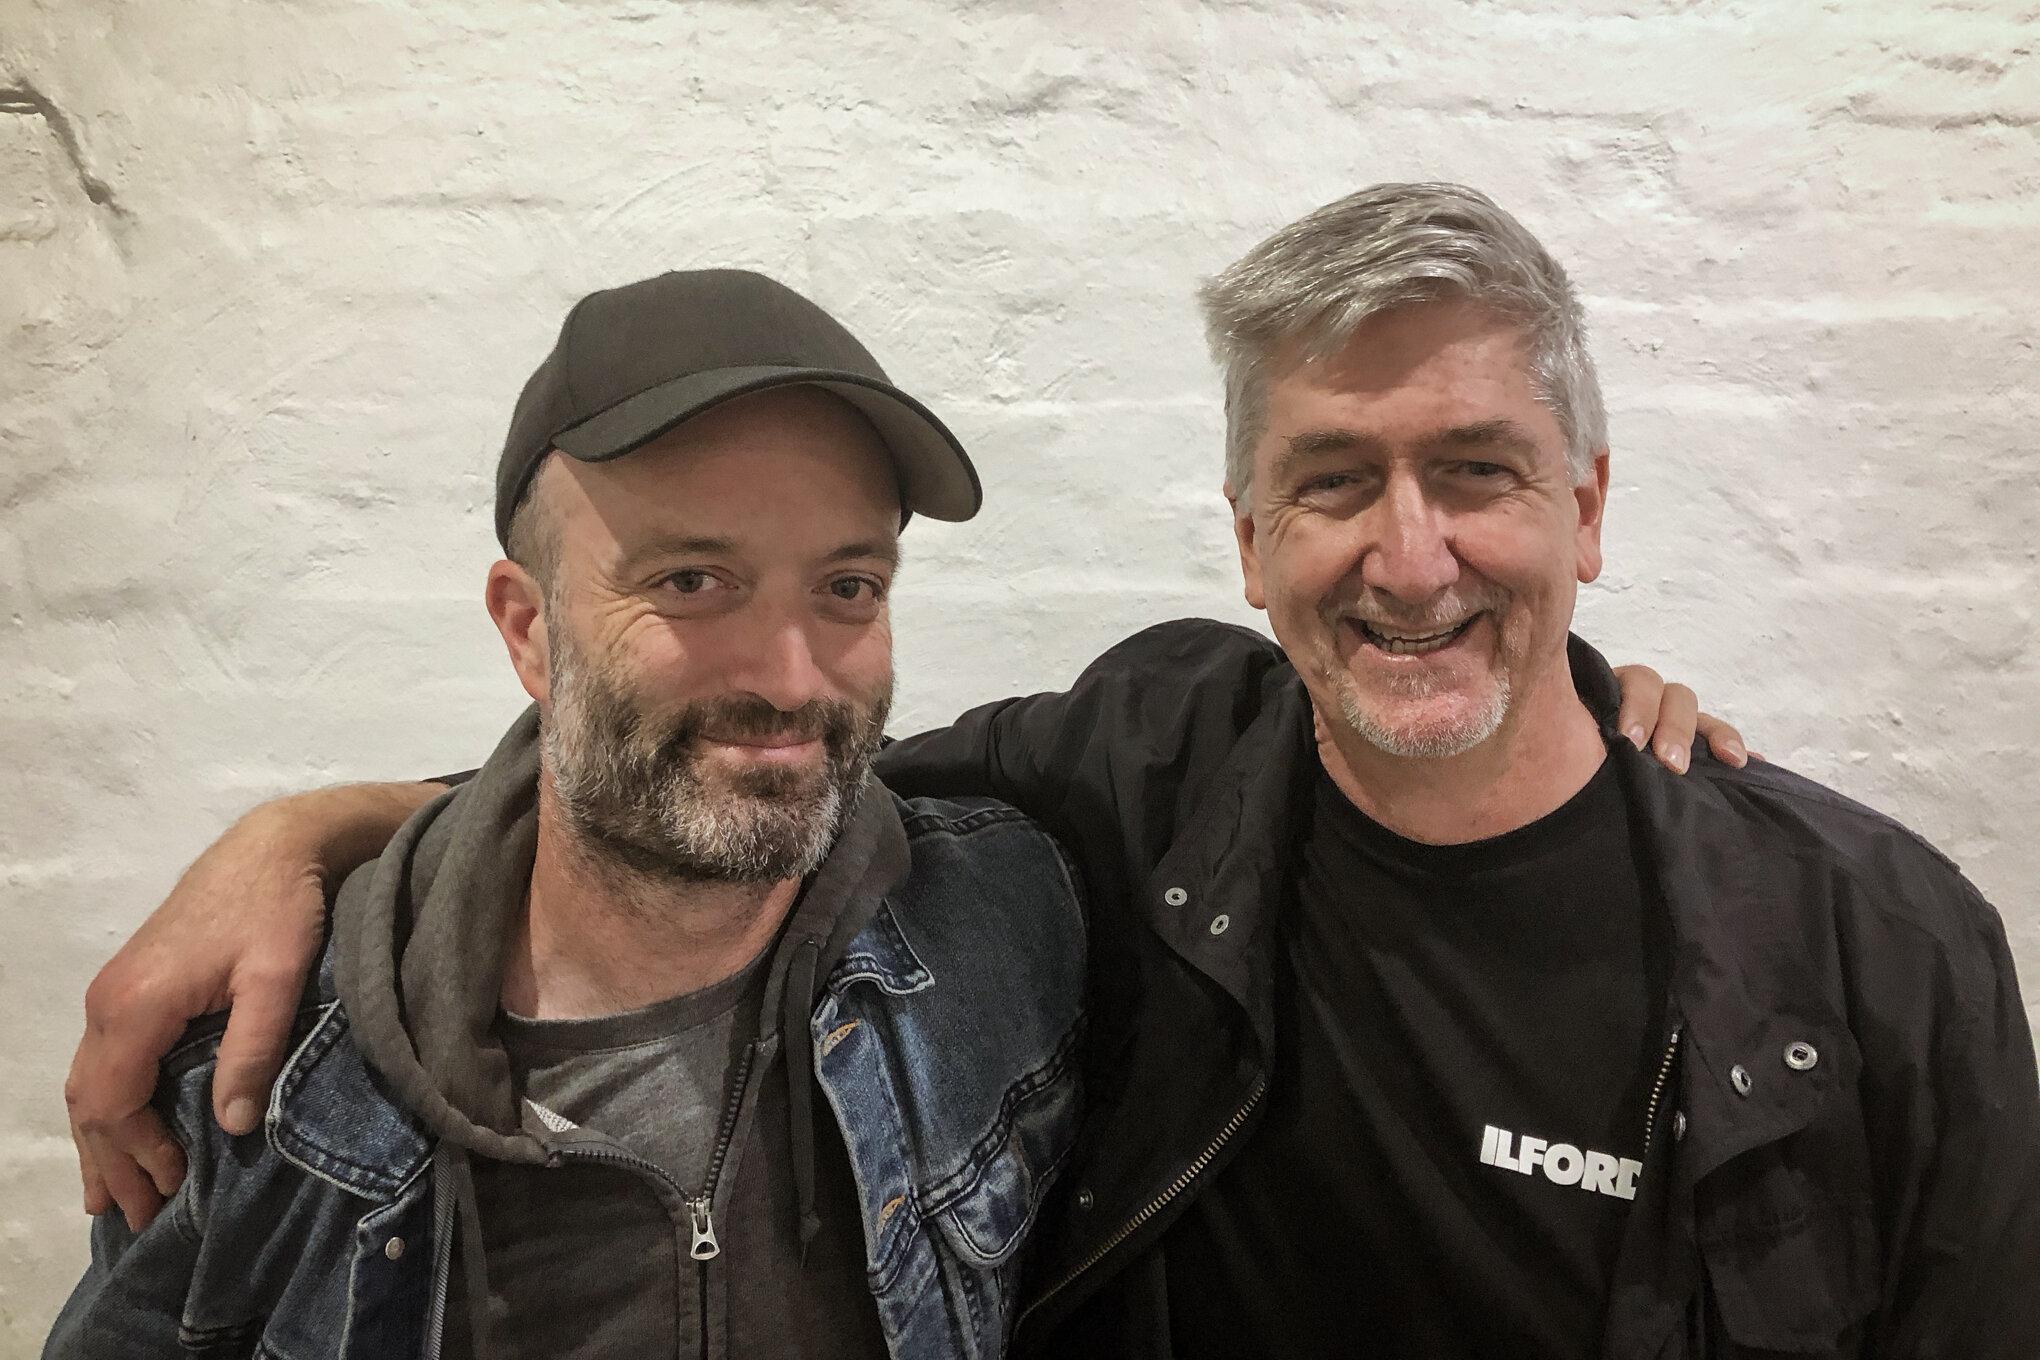 Photograph by Simon Ross, Paddington, 2019